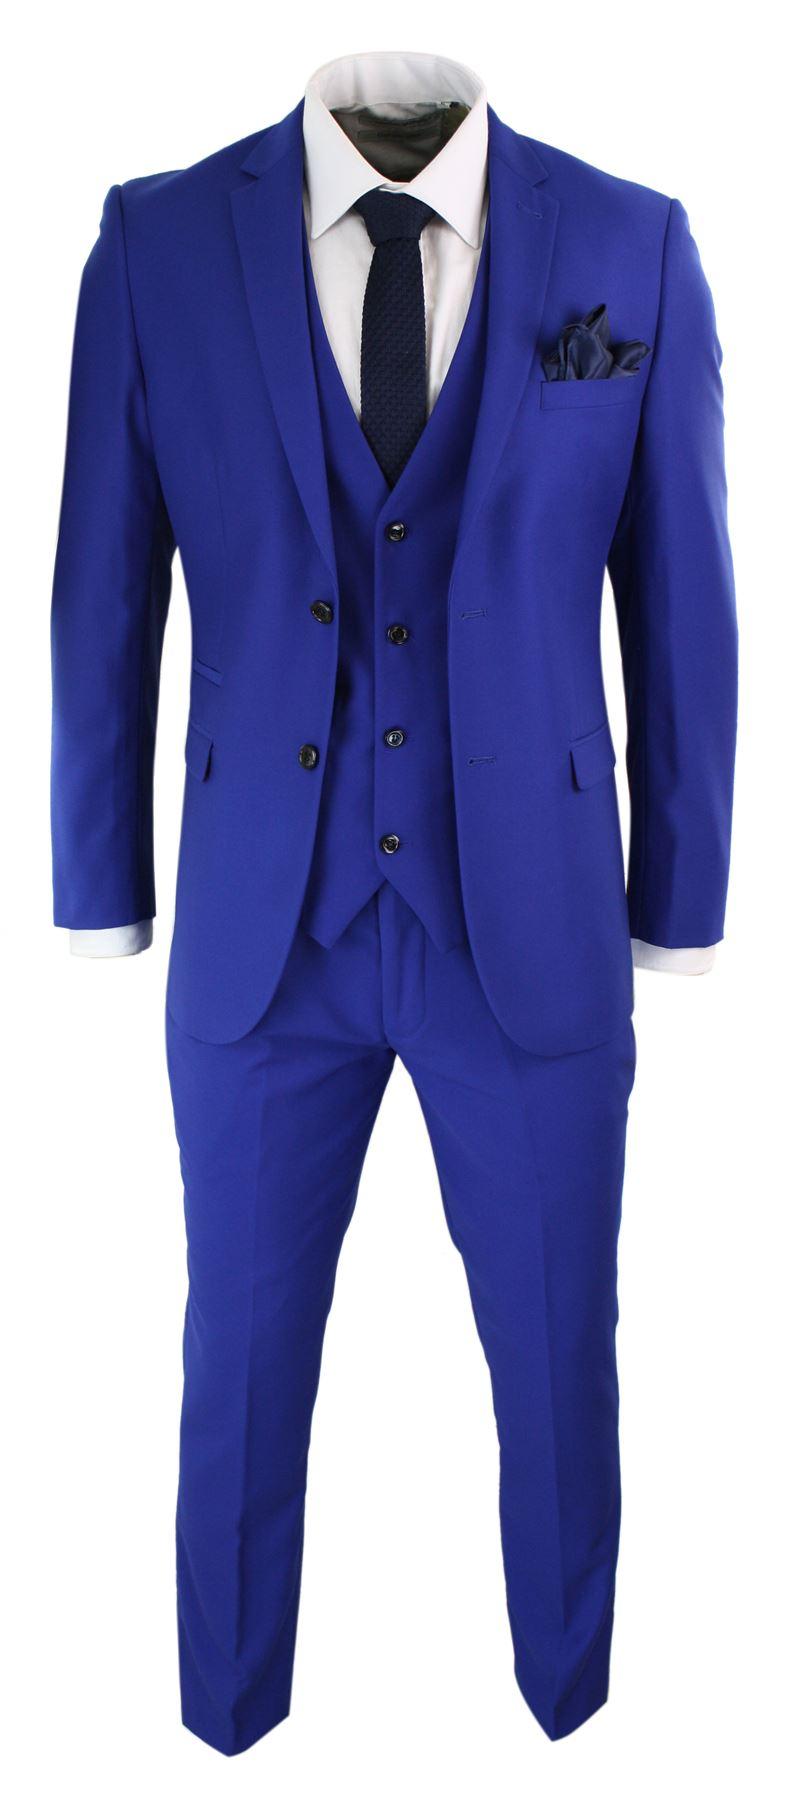 costume 3 pi ces homme bleu roi coupe ajust e chic. Black Bedroom Furniture Sets. Home Design Ideas